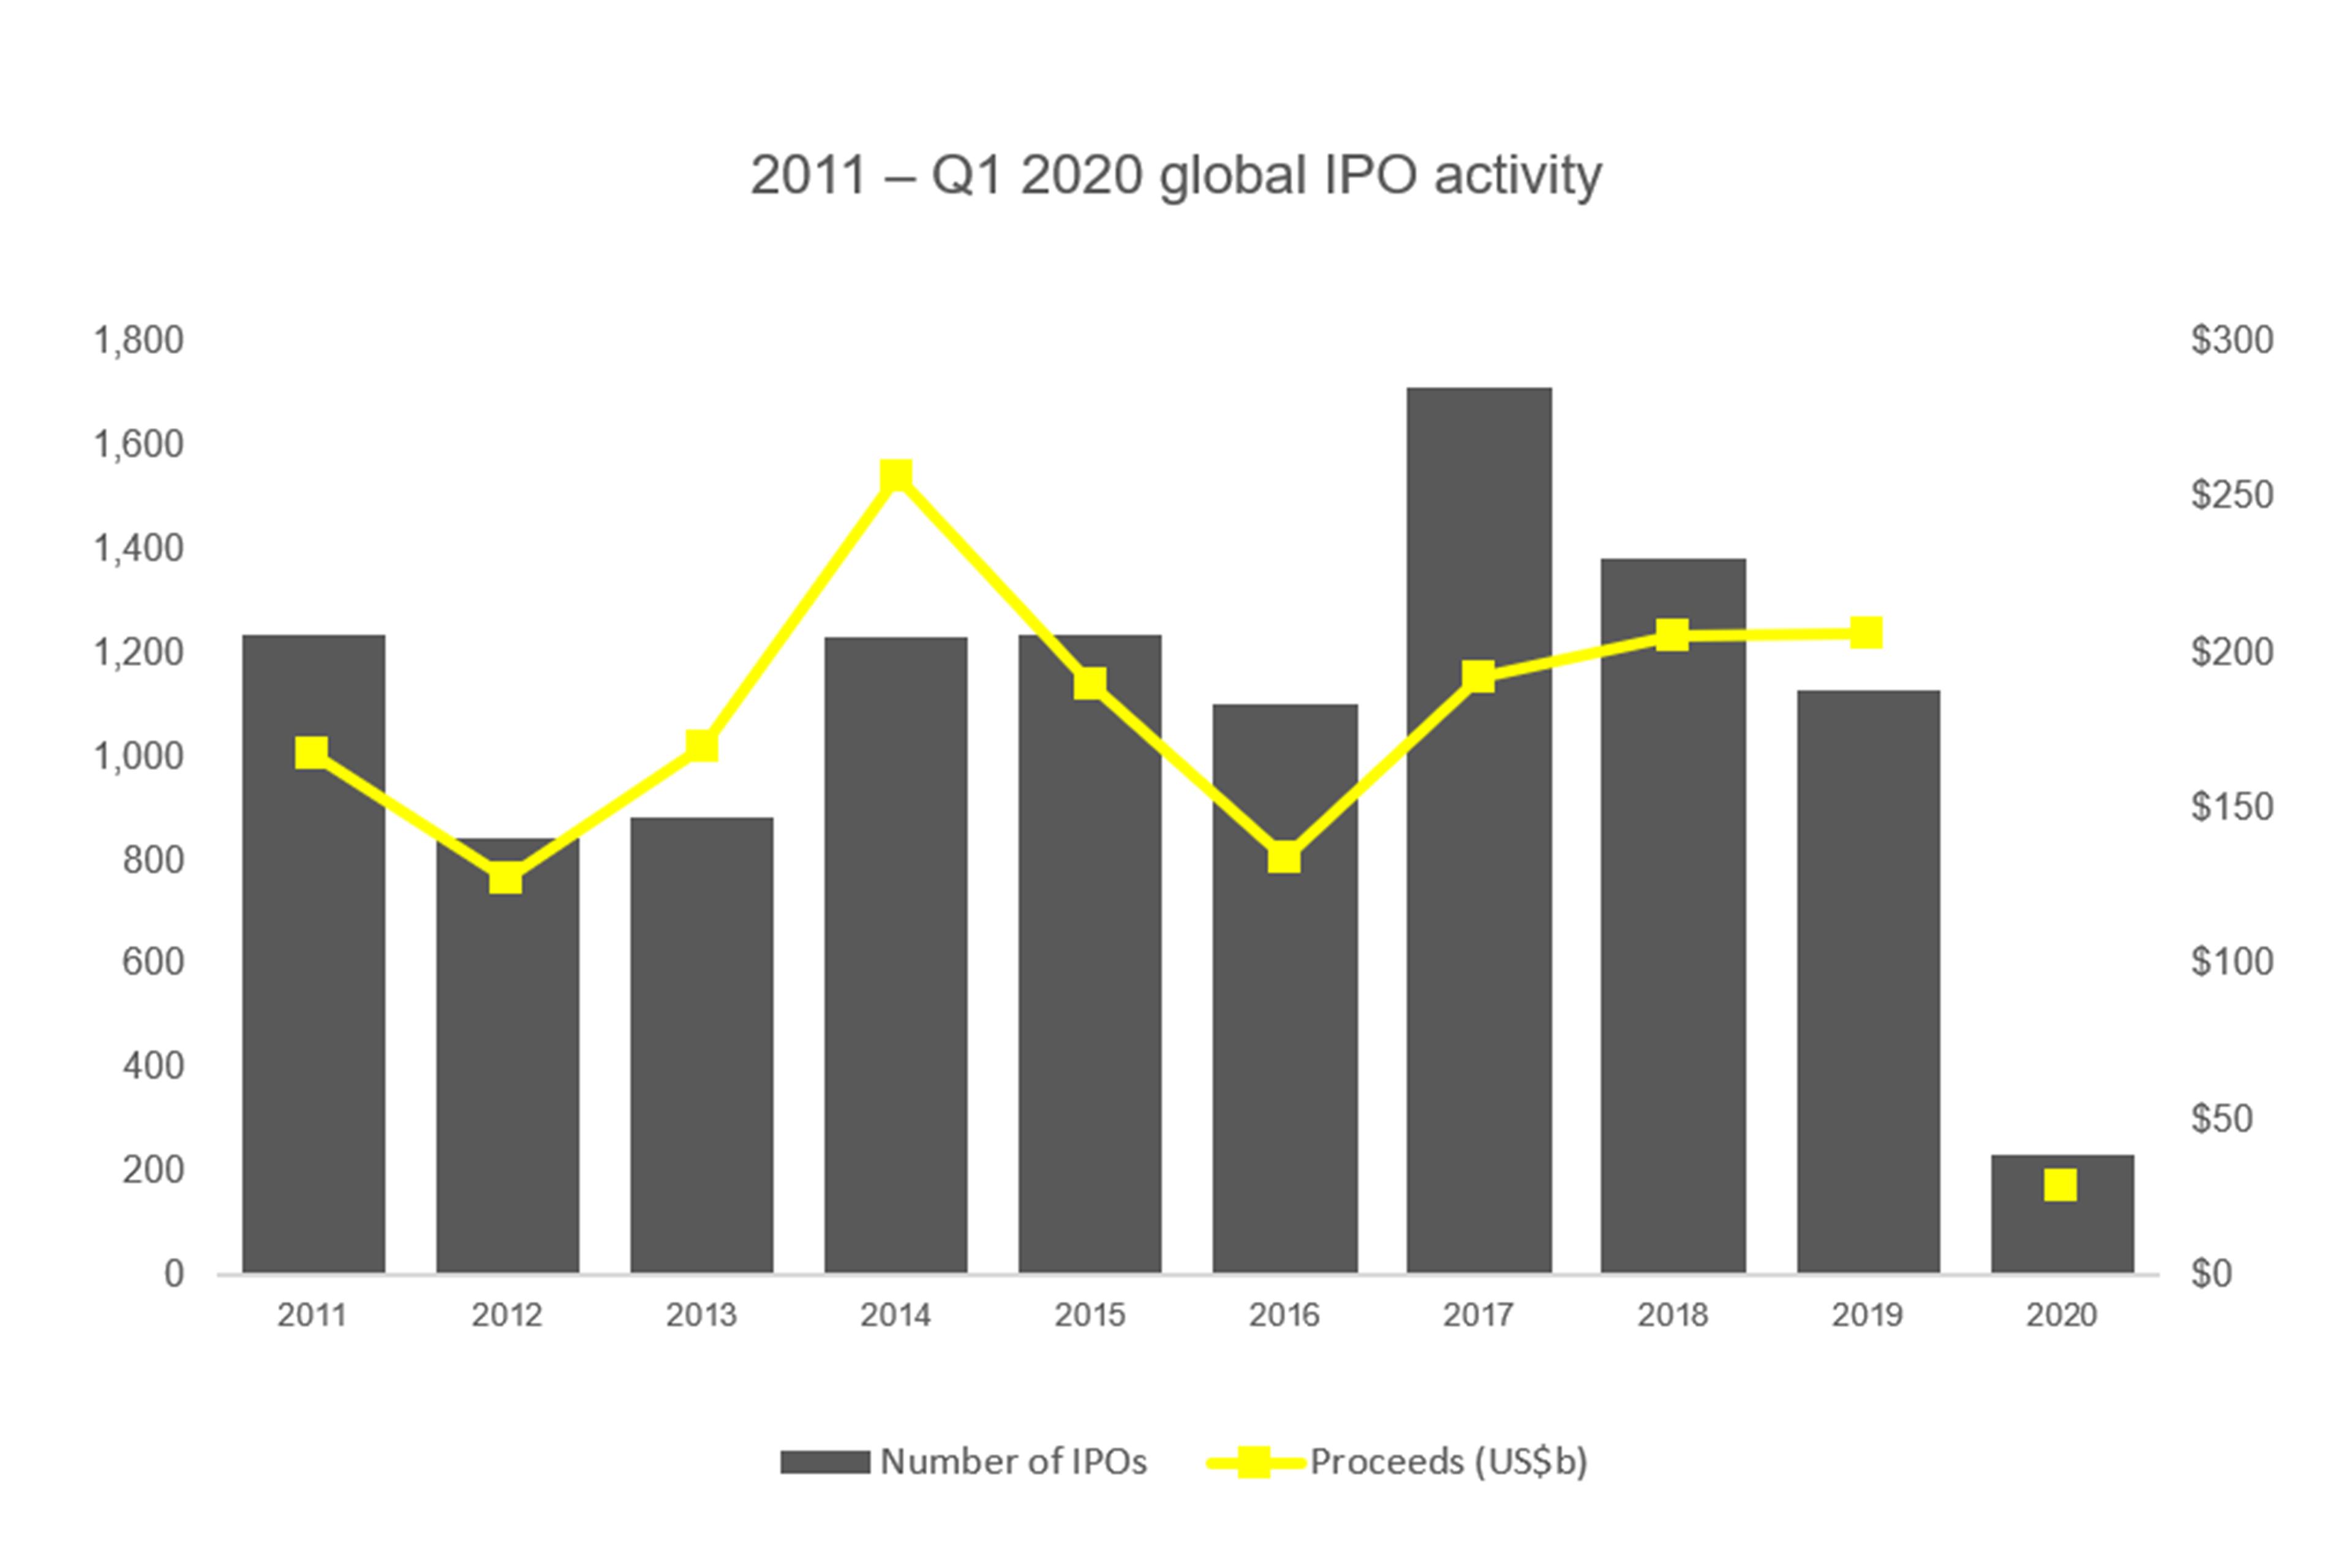 2011 - Q1 2020 global IPO activity